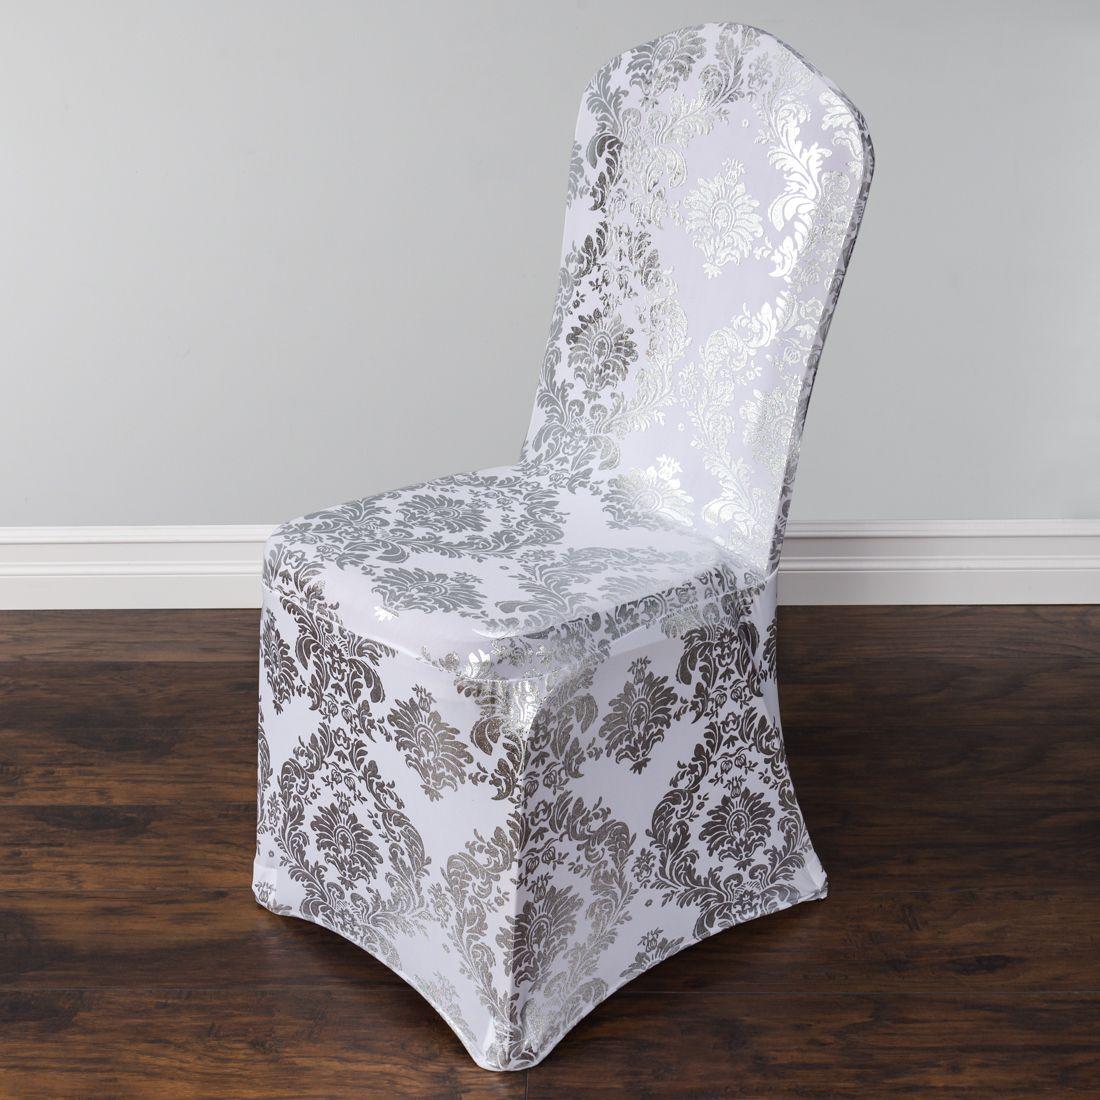 Wedding Chair Alibaba Kneeling Ikea Silver Metallic Damask Stretch Banquet Cover